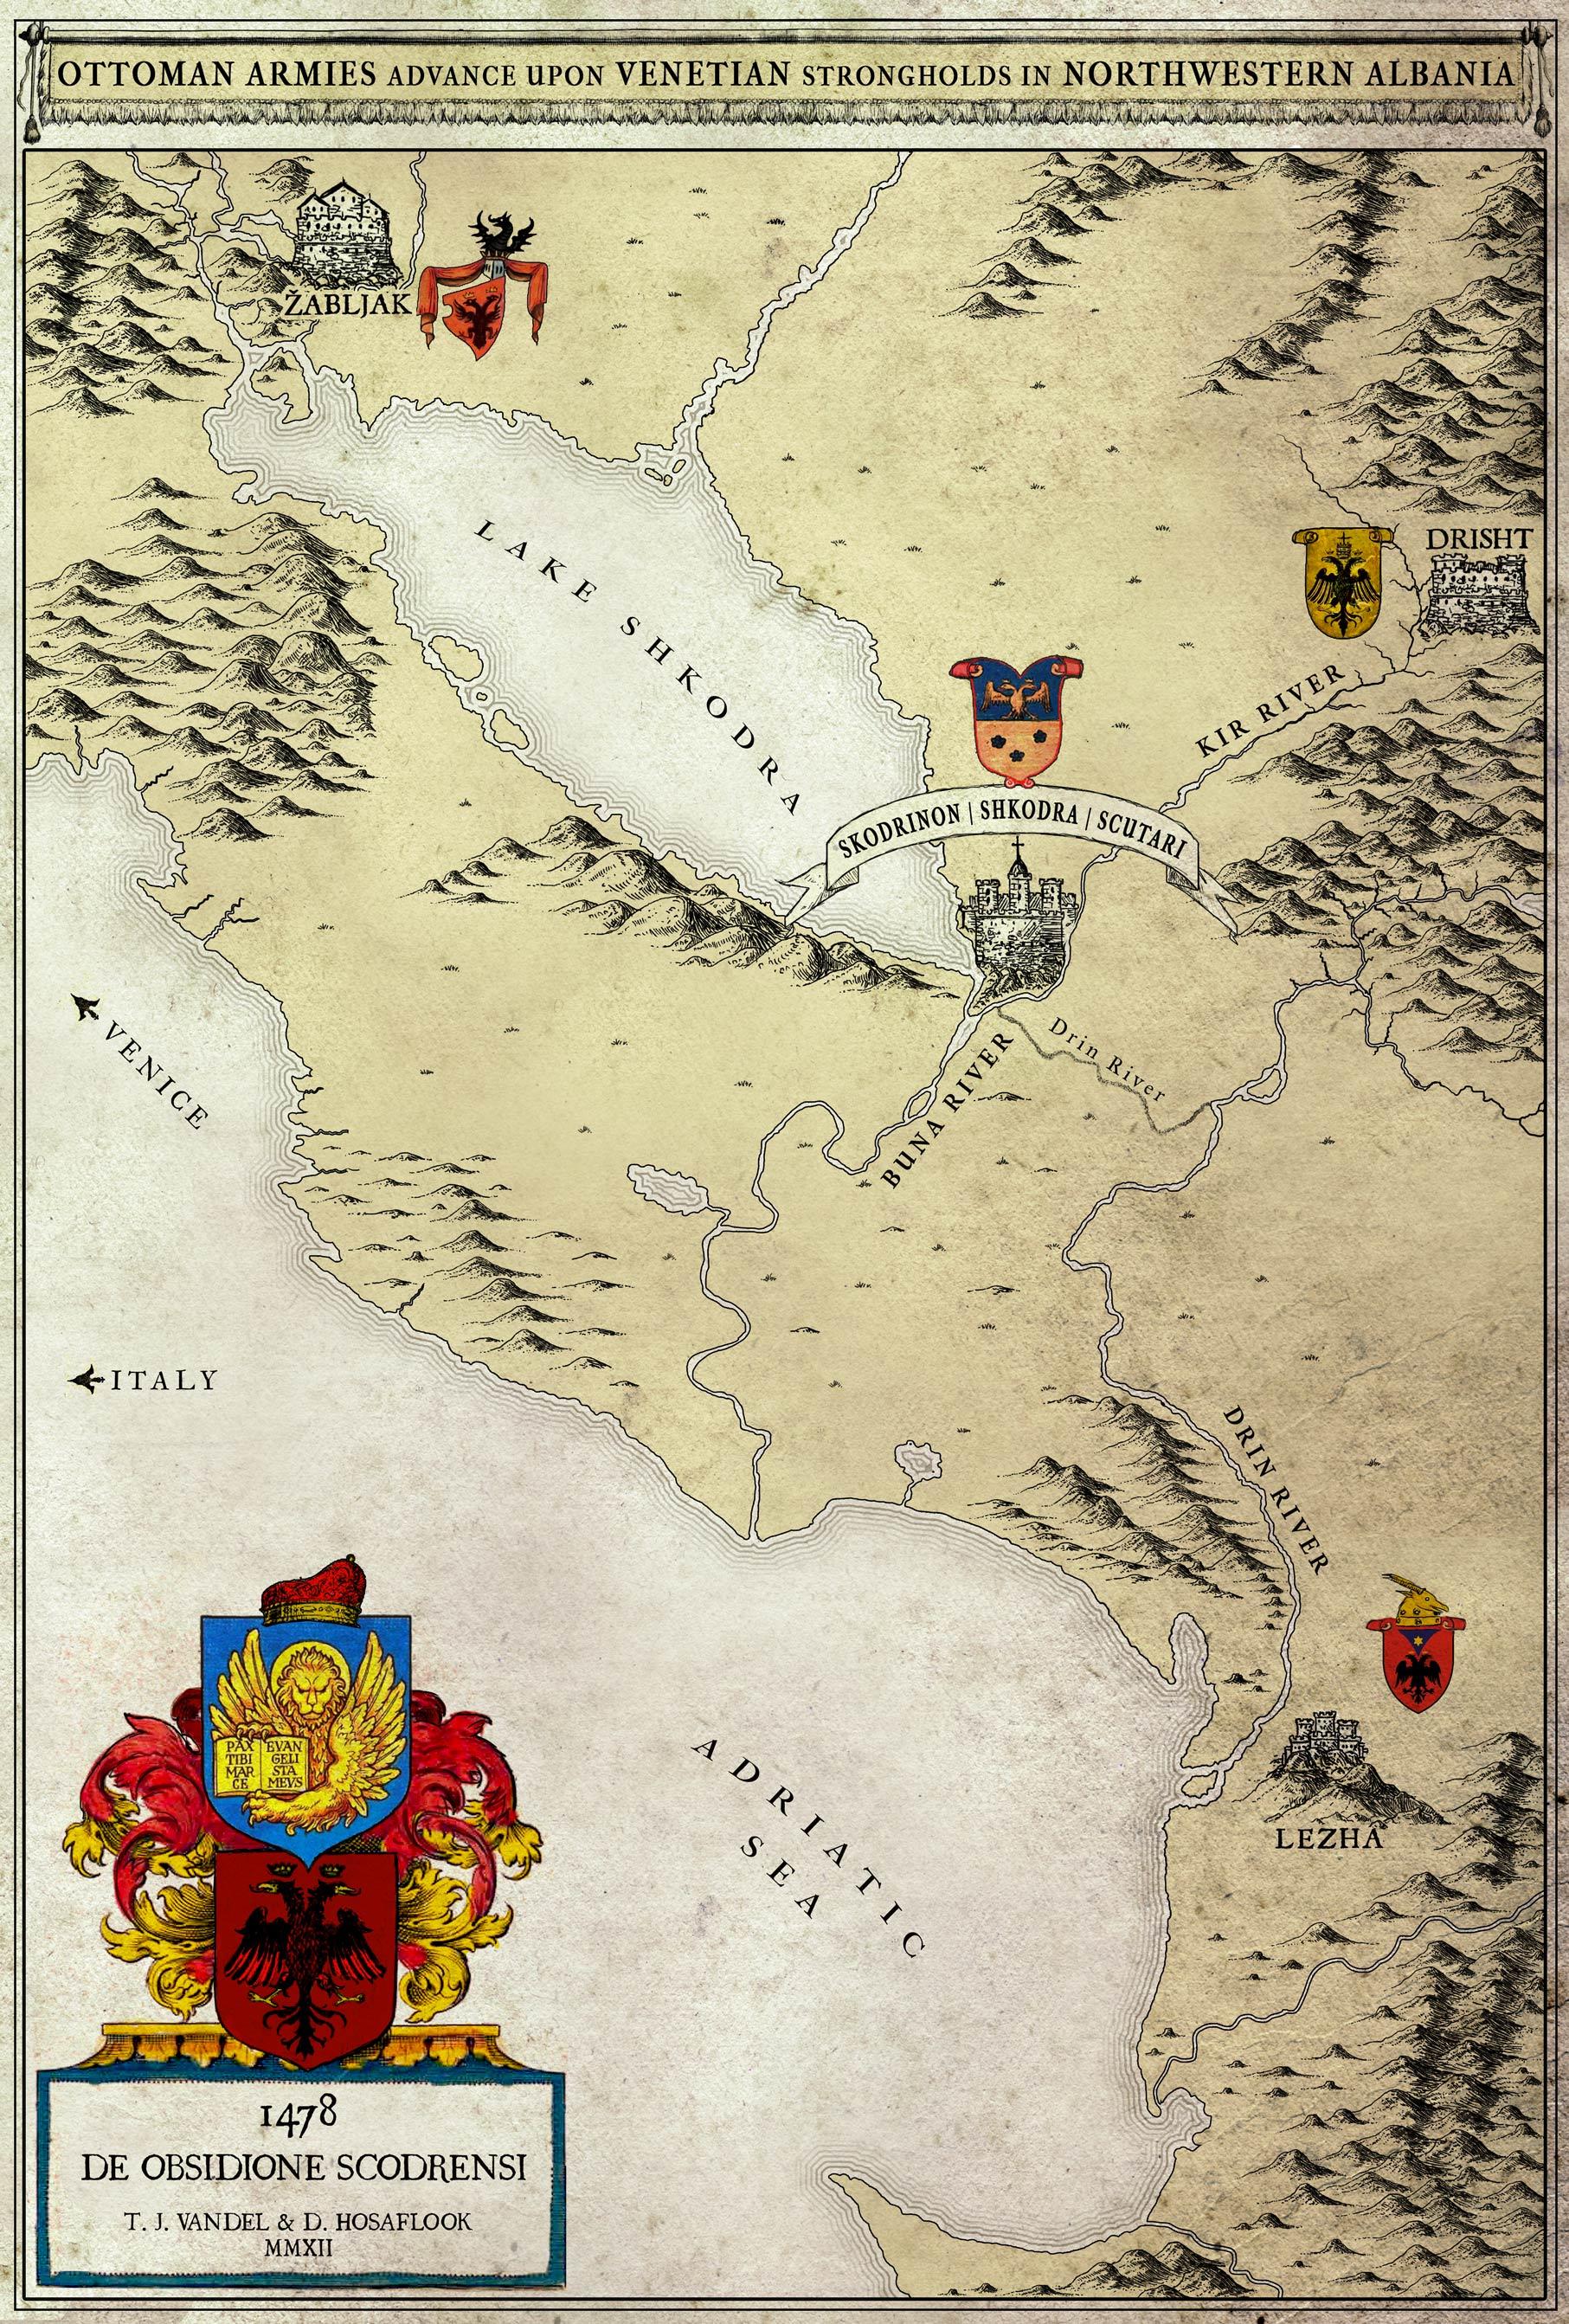 Siege of Shkodra